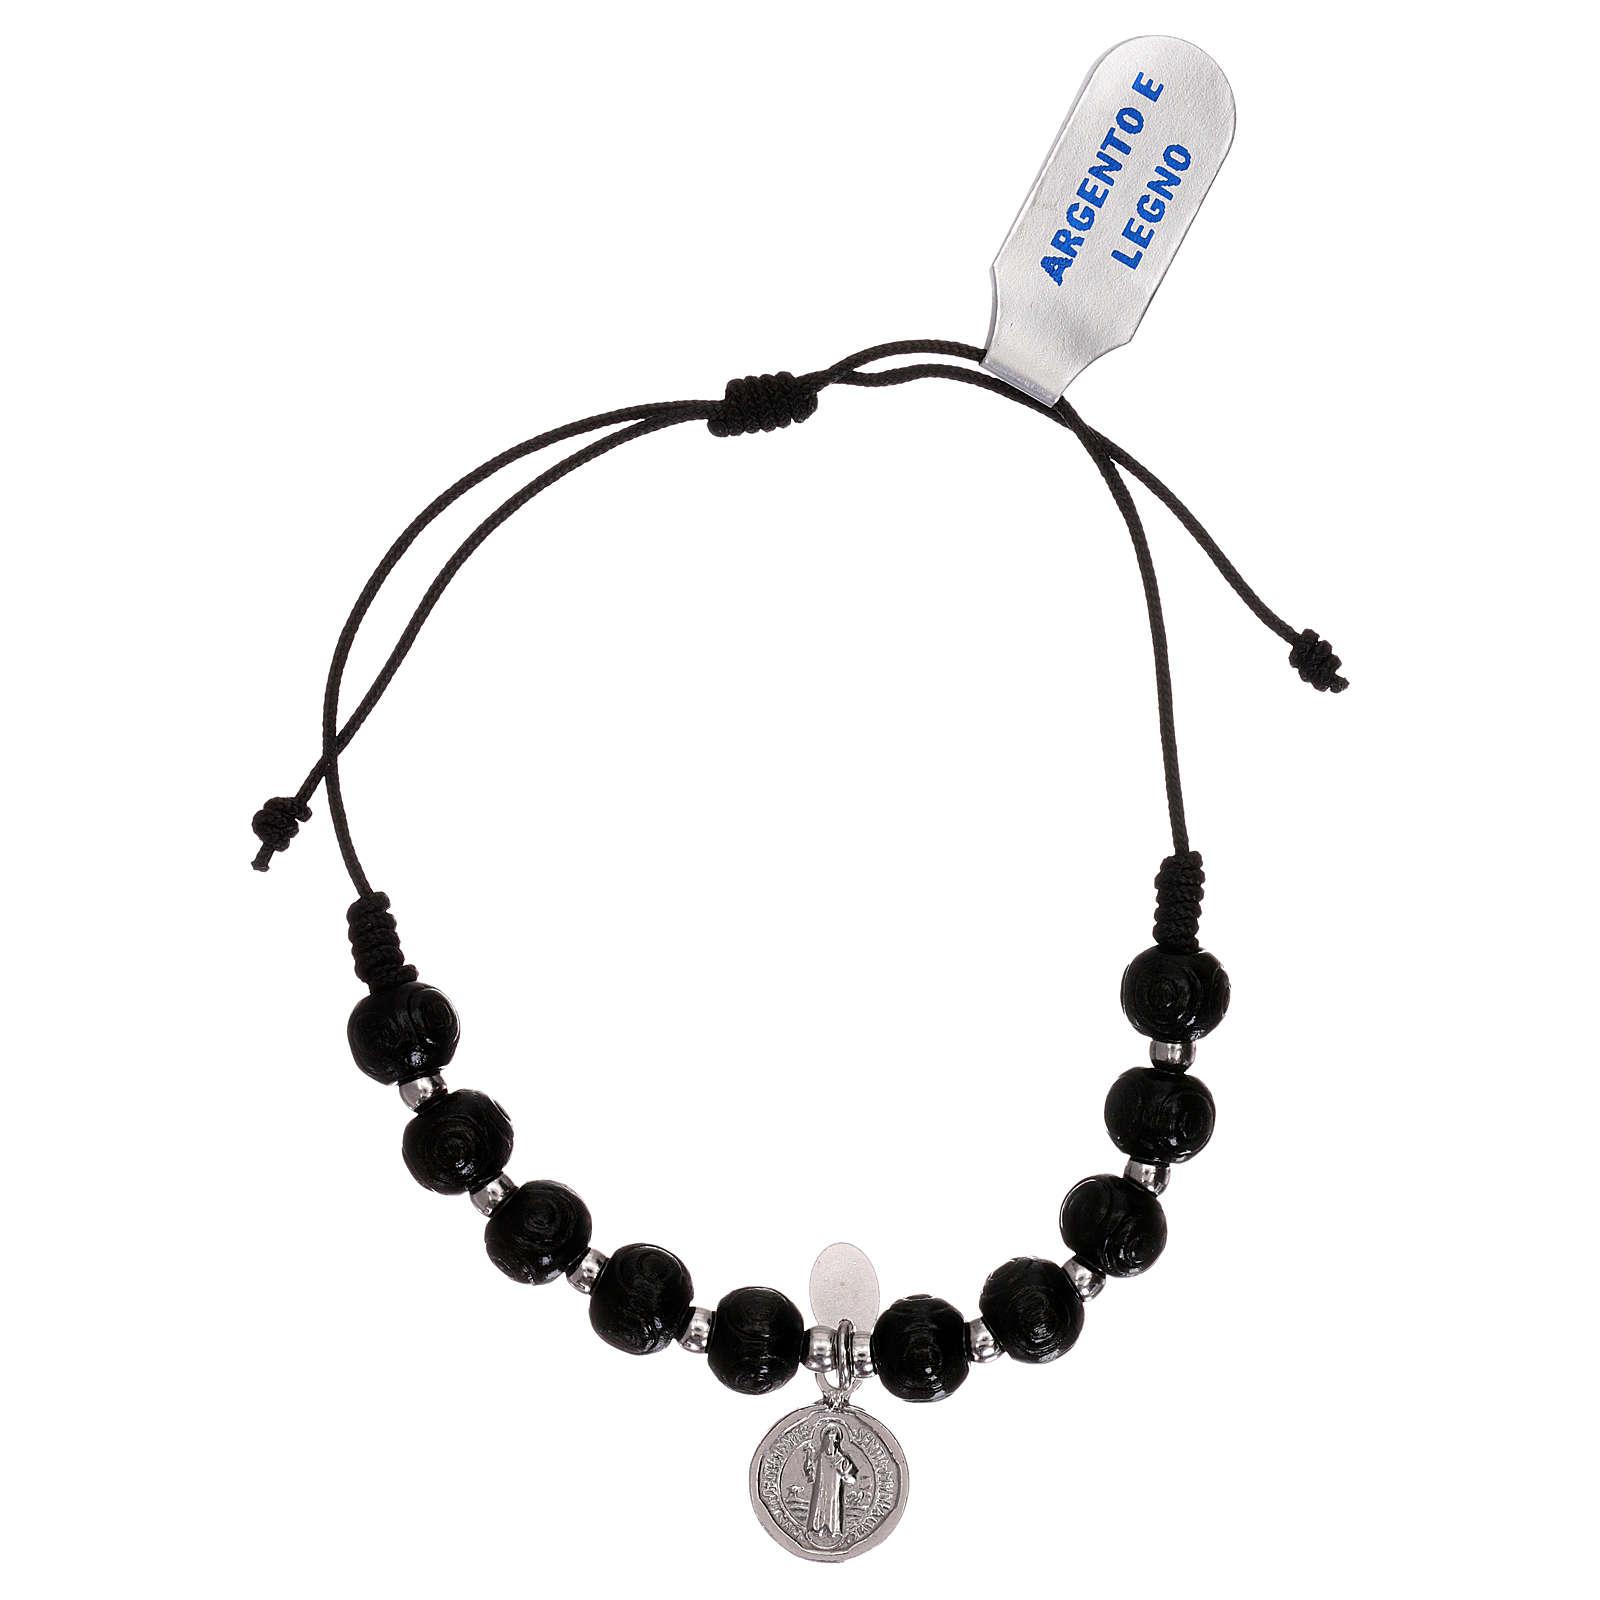 Pulsera rosario de madera negra tallada con medalla pequeña 4